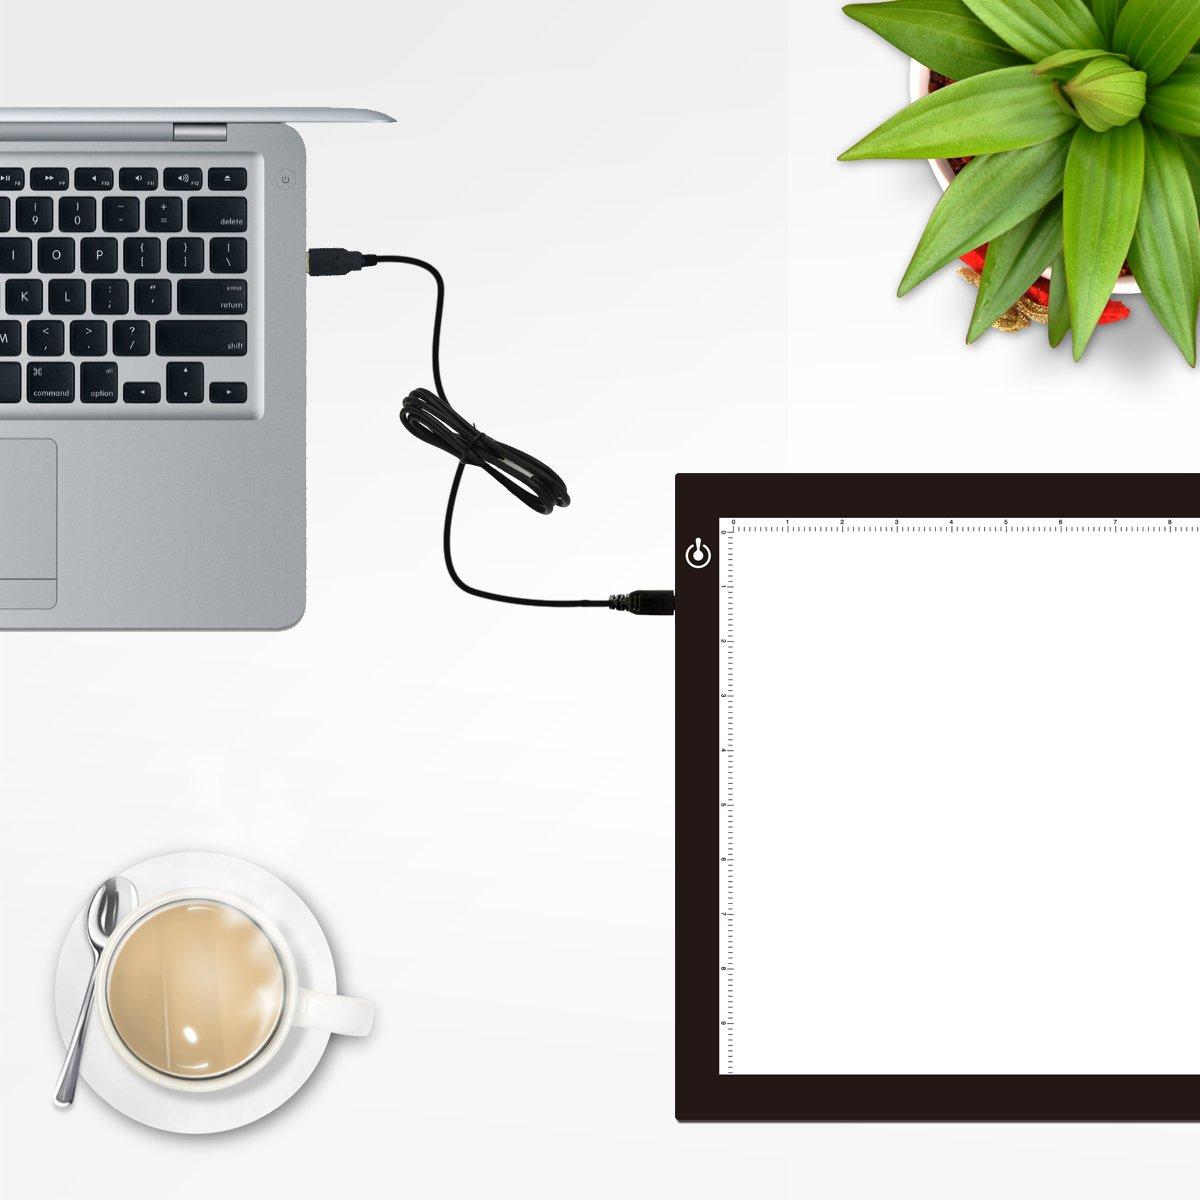 "Amazon.com: Litup Light Box Light Pad L15.63""x W11.81"" Tracing Light Box Drawing Light Board Light Table for Animation Sketching Artcraft- LP-B4"